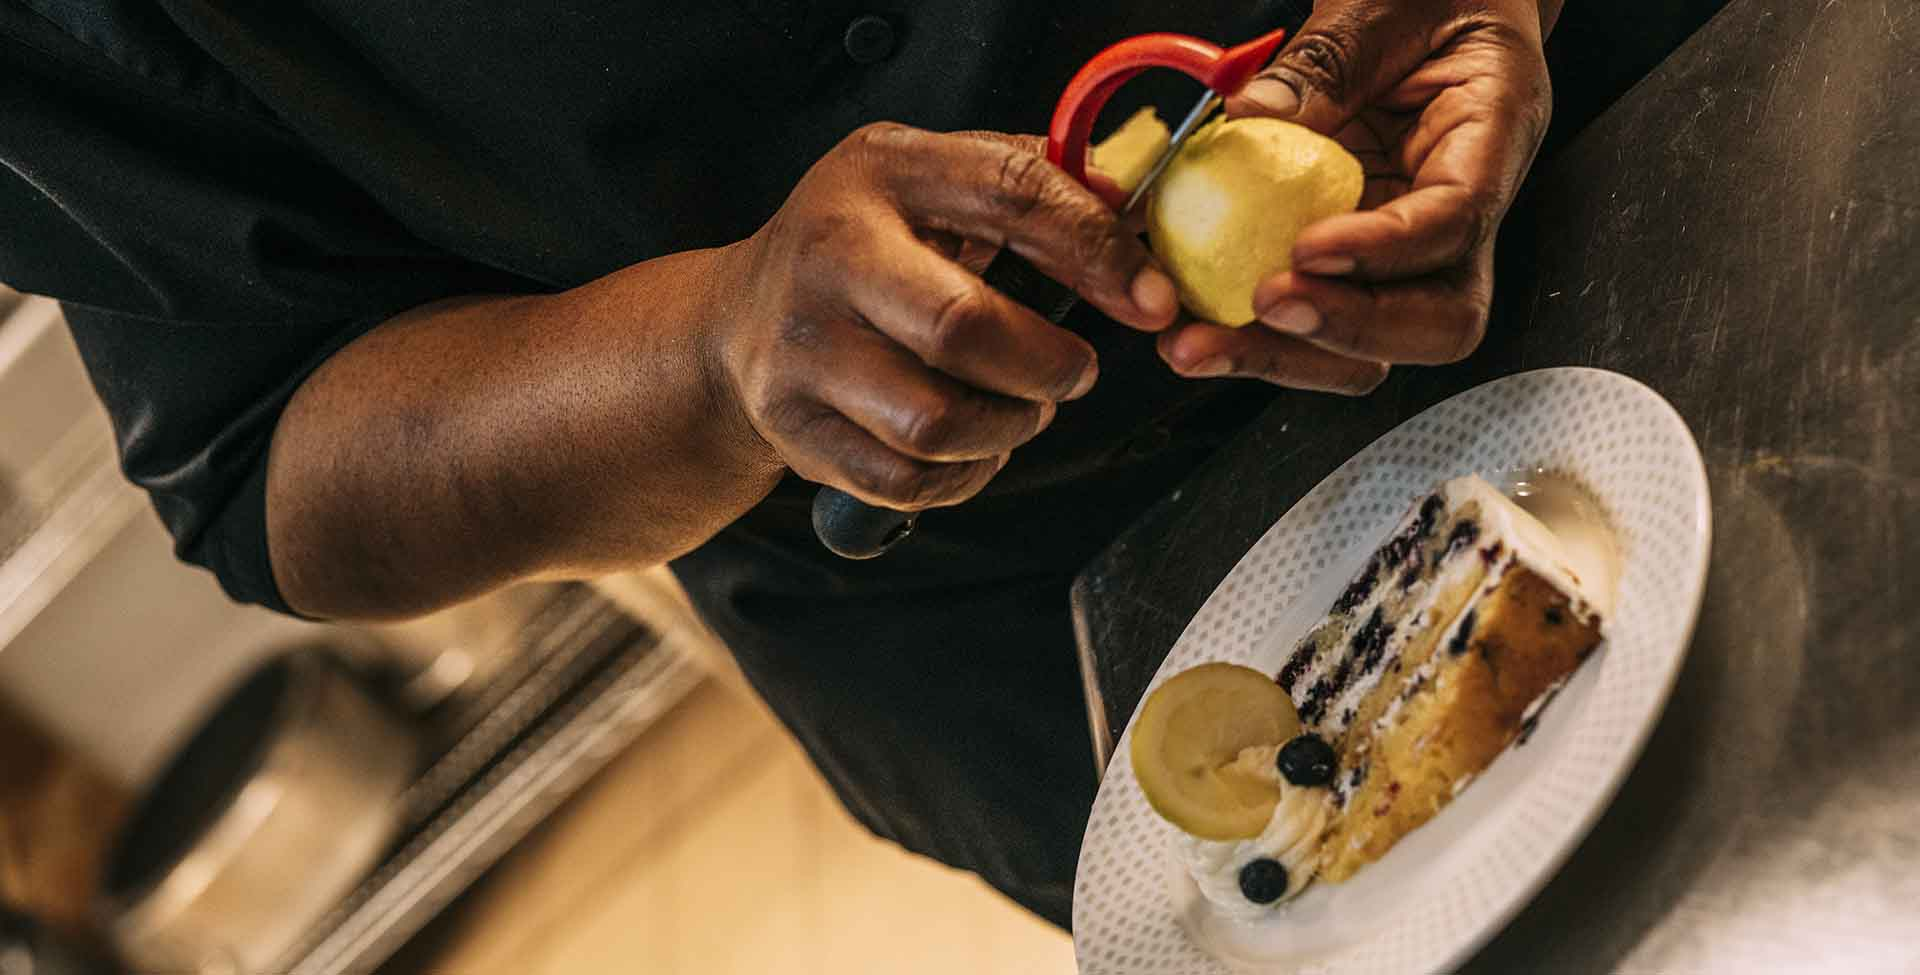 chef peeling fruit